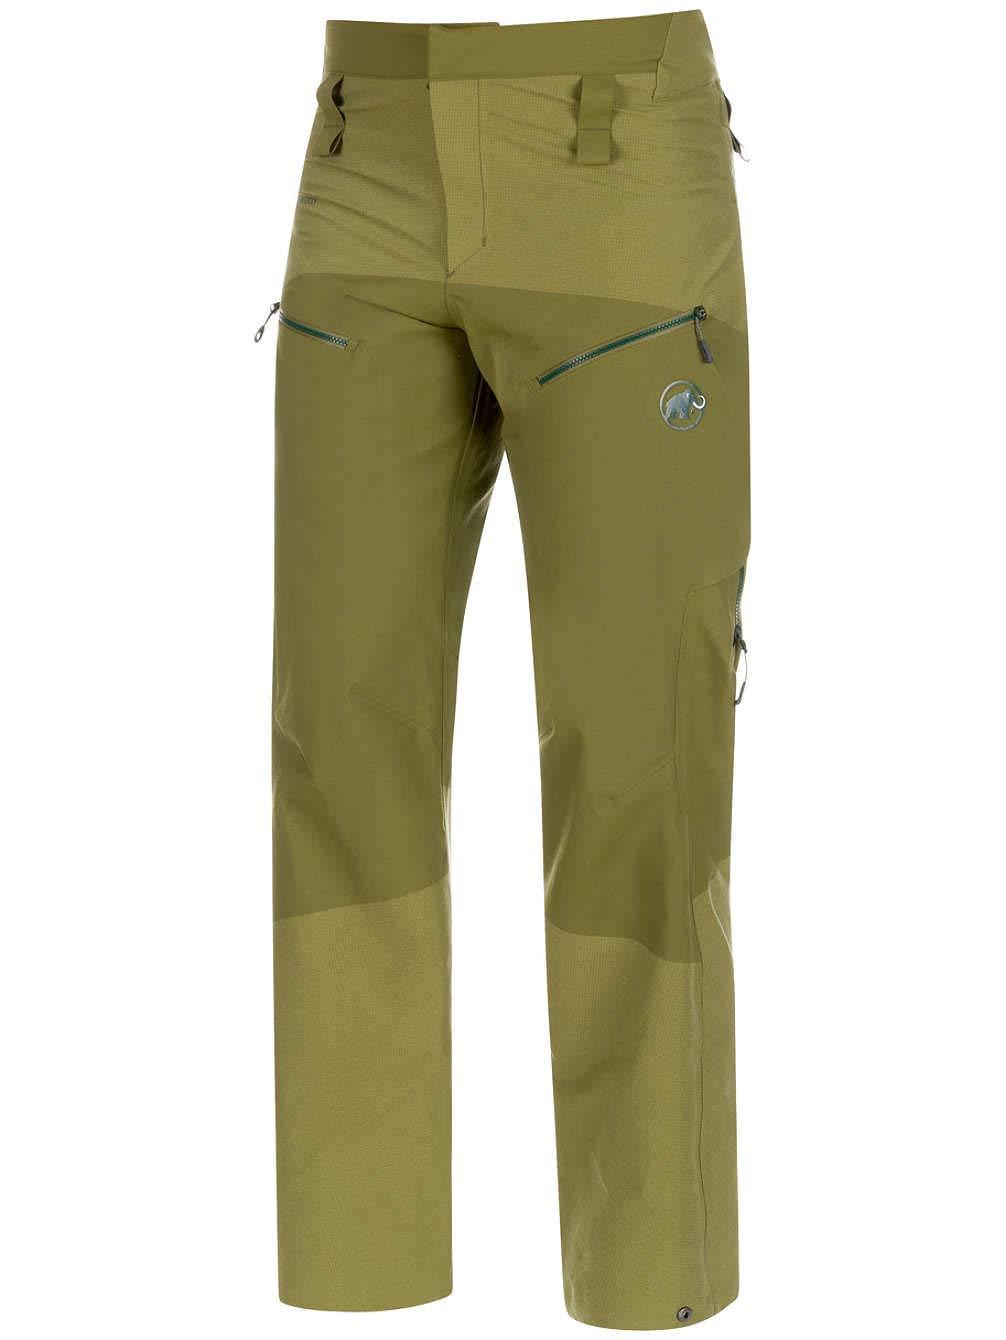 TALLA 50. Mammut ALYESKA Armor HS - Pantalón, Hombre, Verde(Clover)